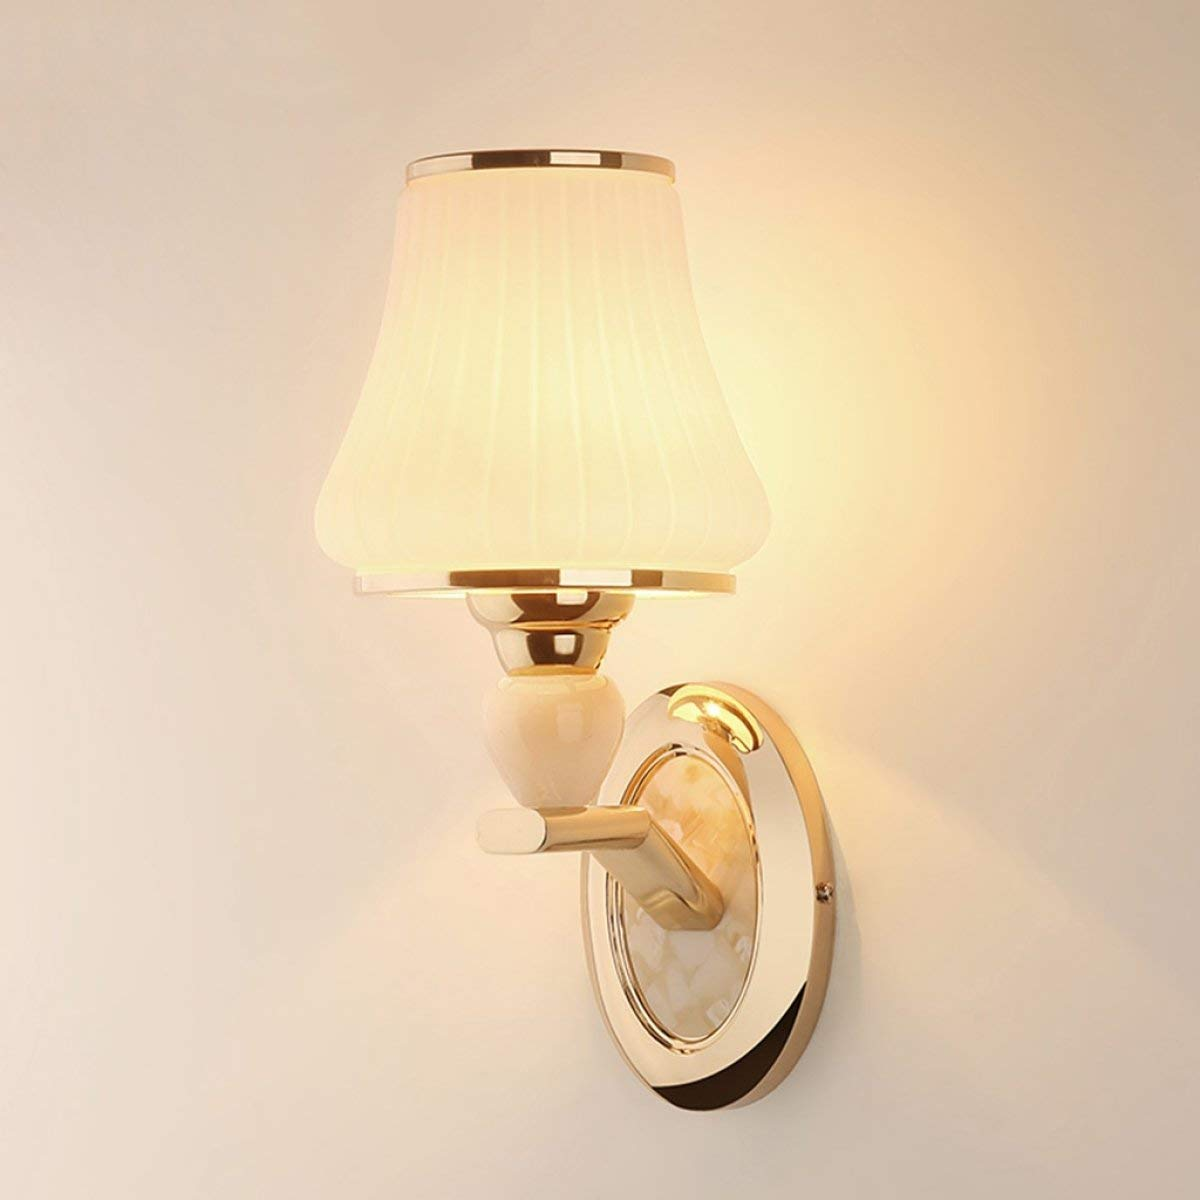 TJTJ 現代のシンプルなシングルヘッドウォールランプの寝室のリビングルームチャンネルバルコニーウォールランプ B07R8KJ73B